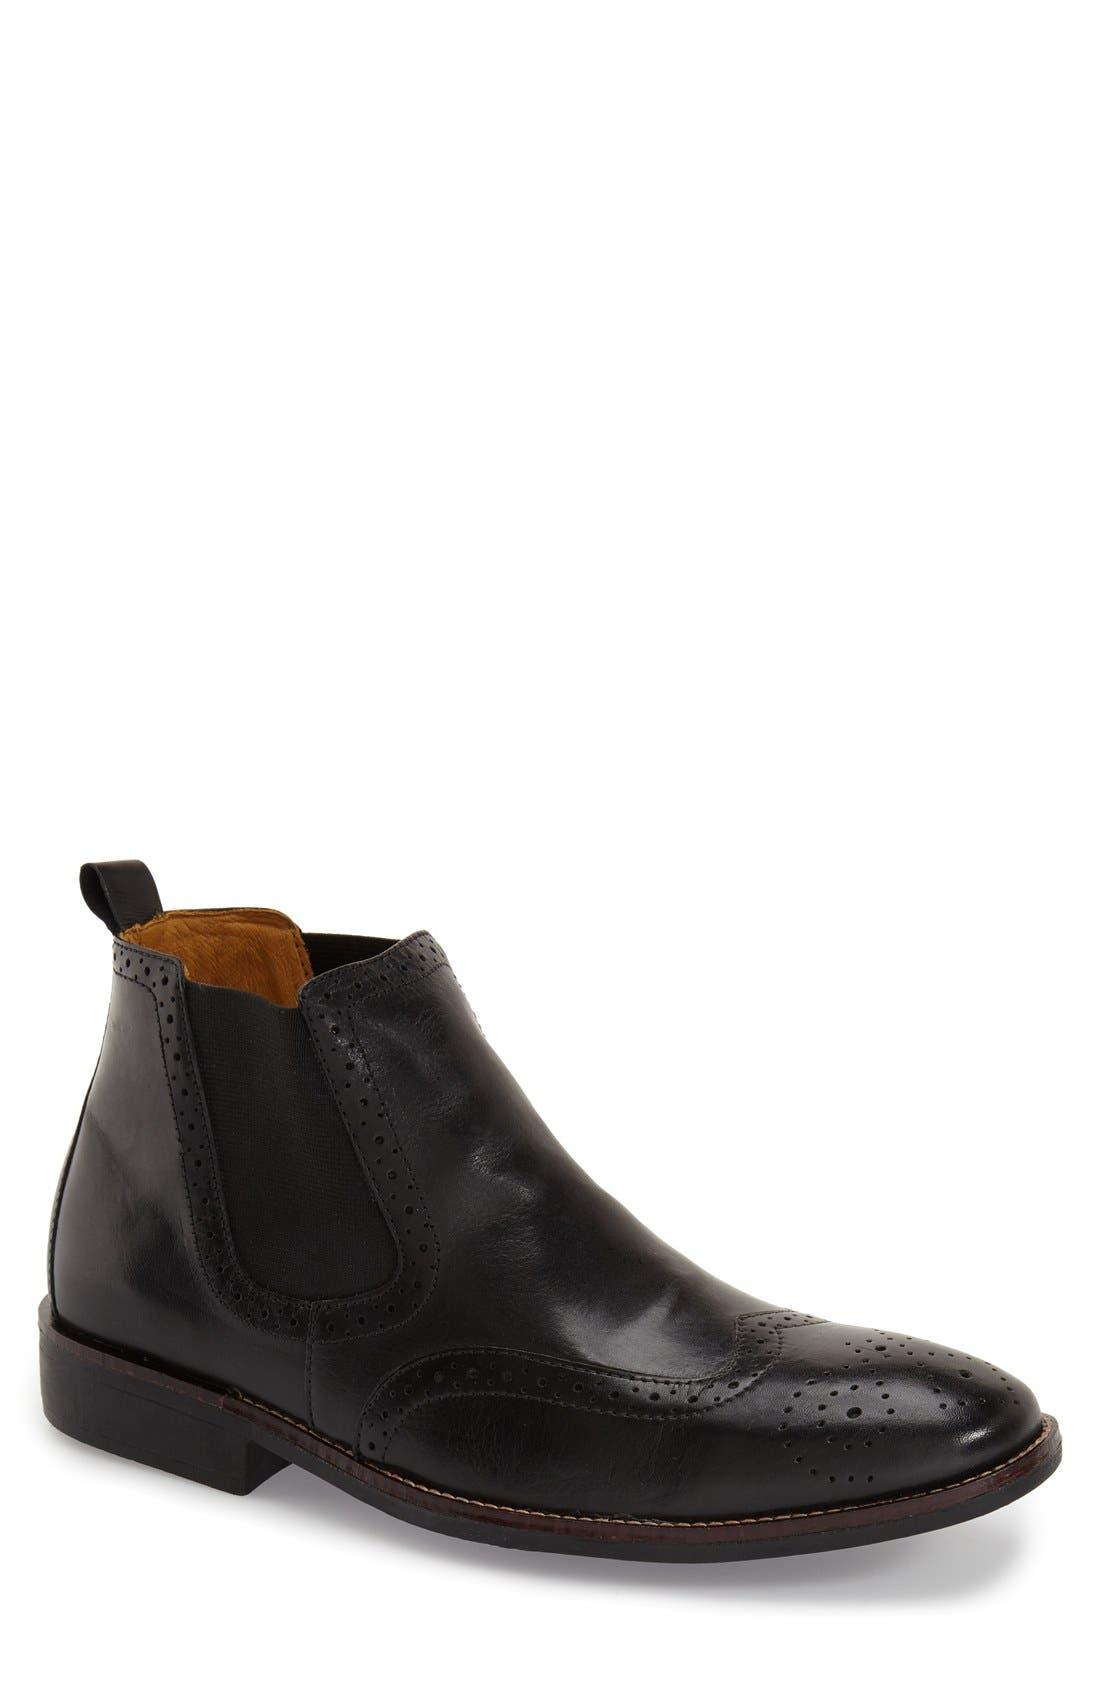 Alternate Image 1 Selected - Sandro Moscoloni 'Elton' Chelsea Boot (Men)